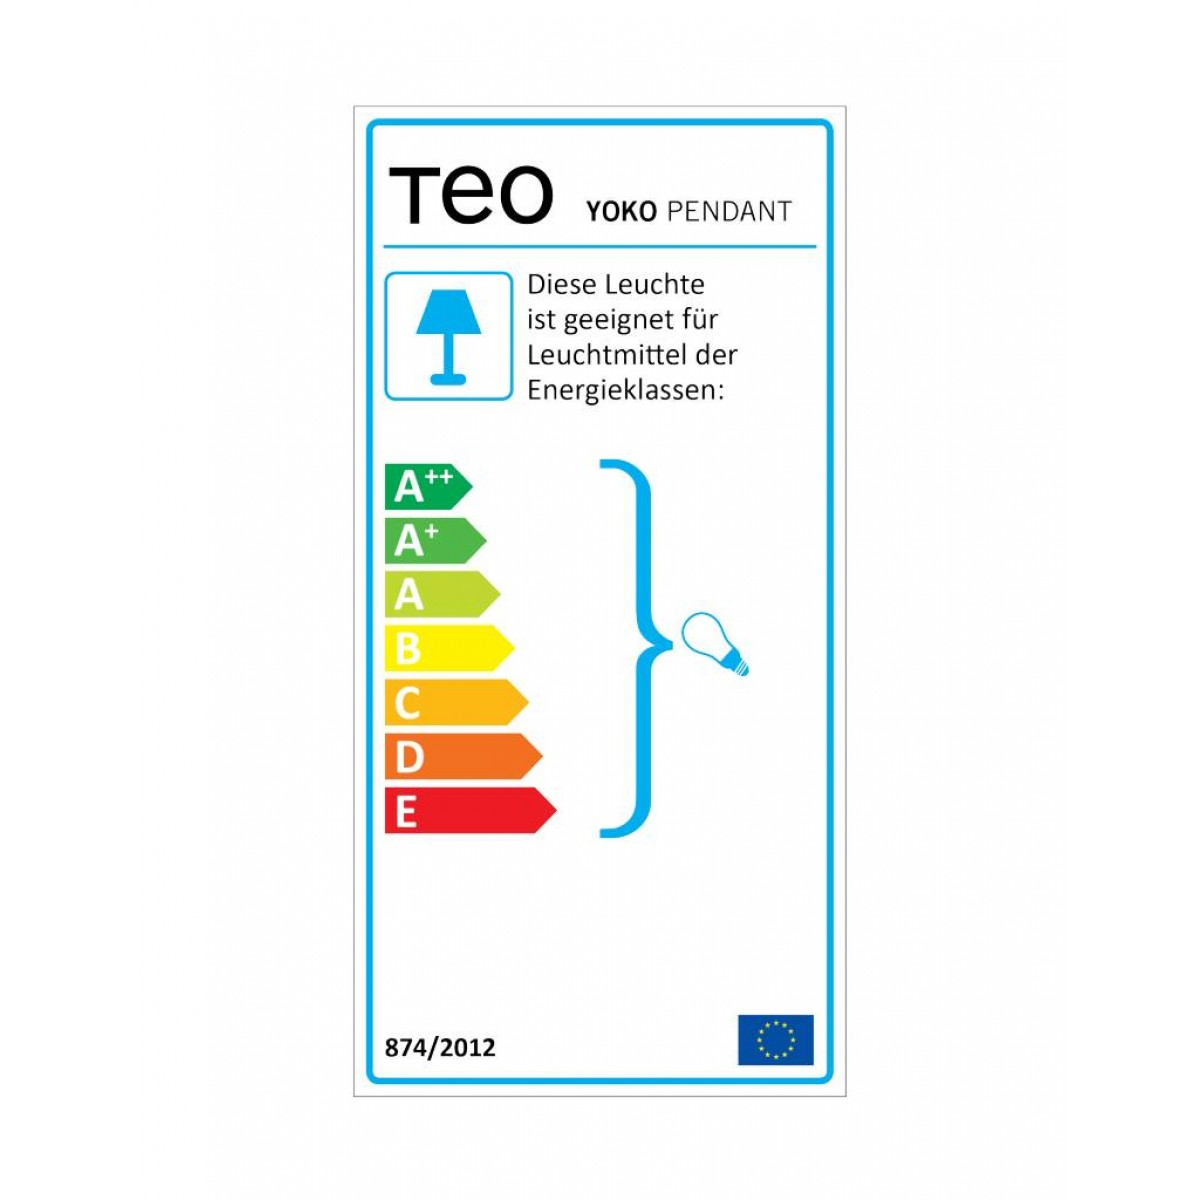 TEO - YOKO - Hängeleuchte (dunkelgrau)